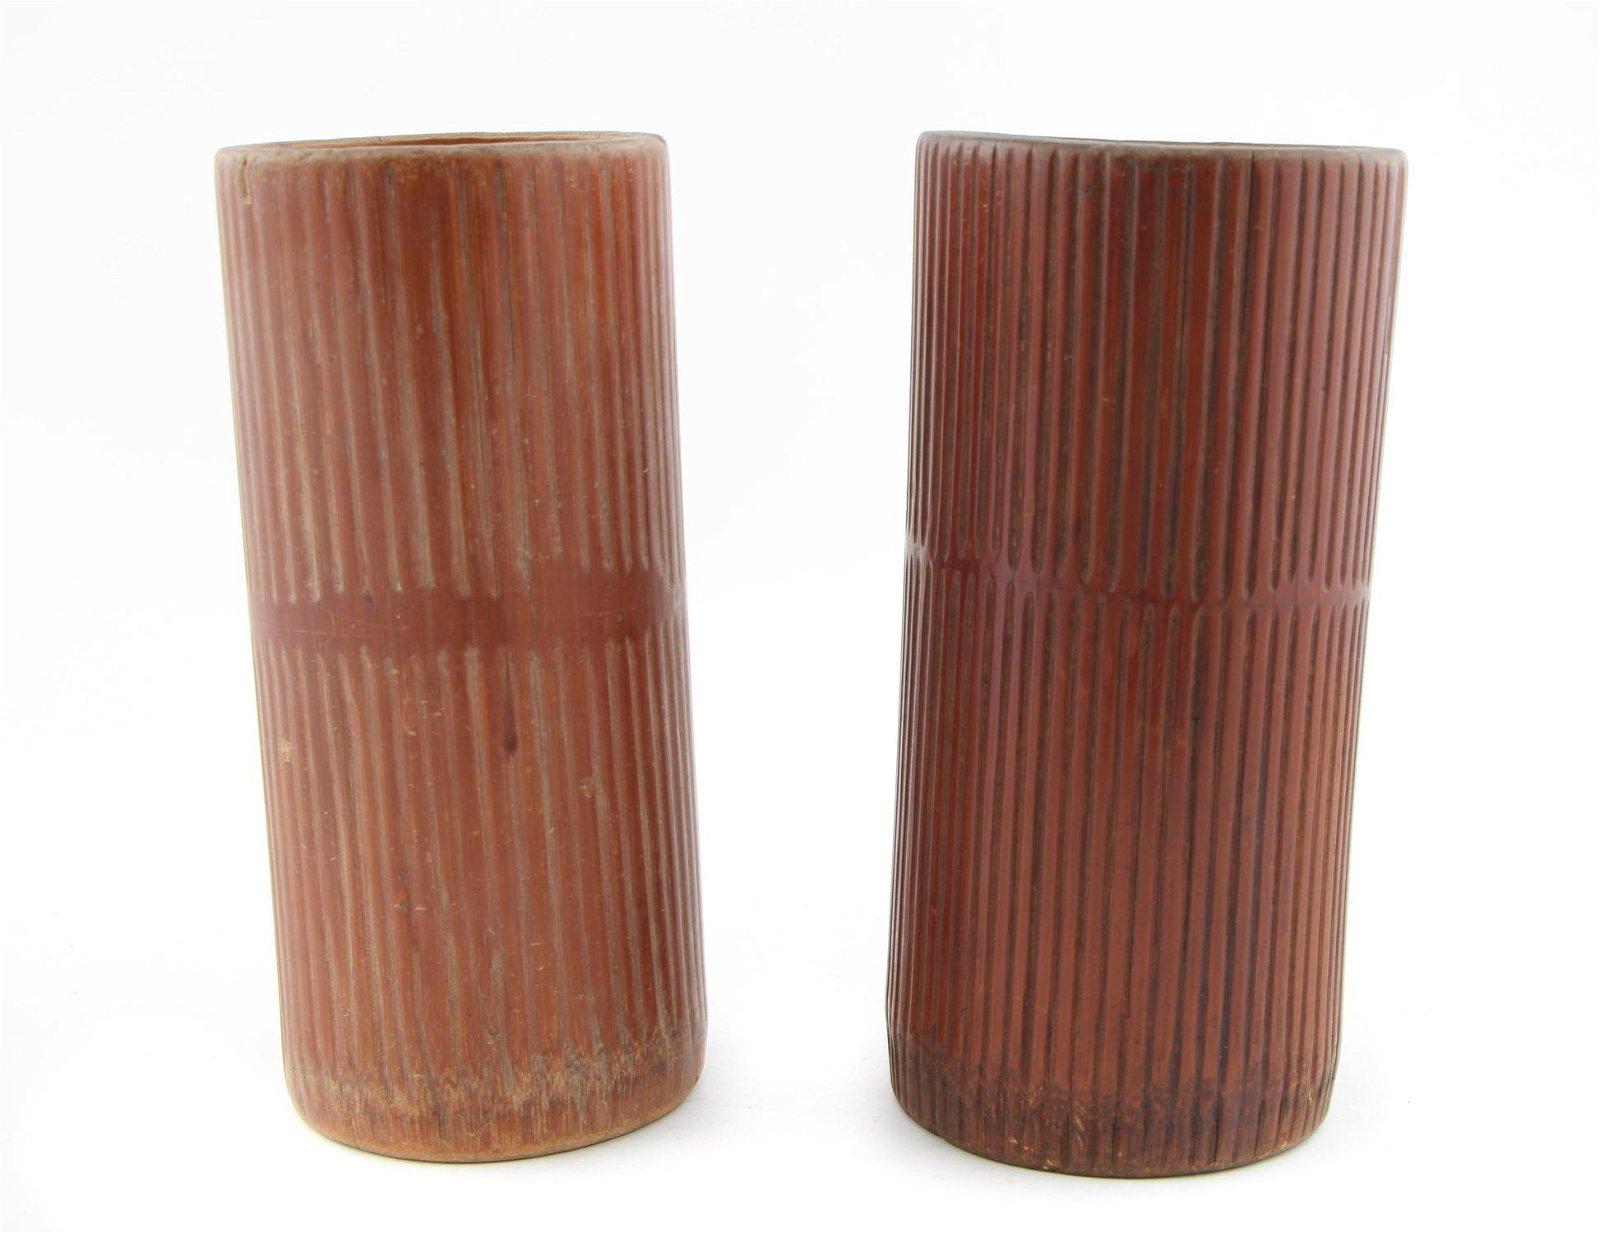 2 Large Chinese  Bamboo Brush Pots